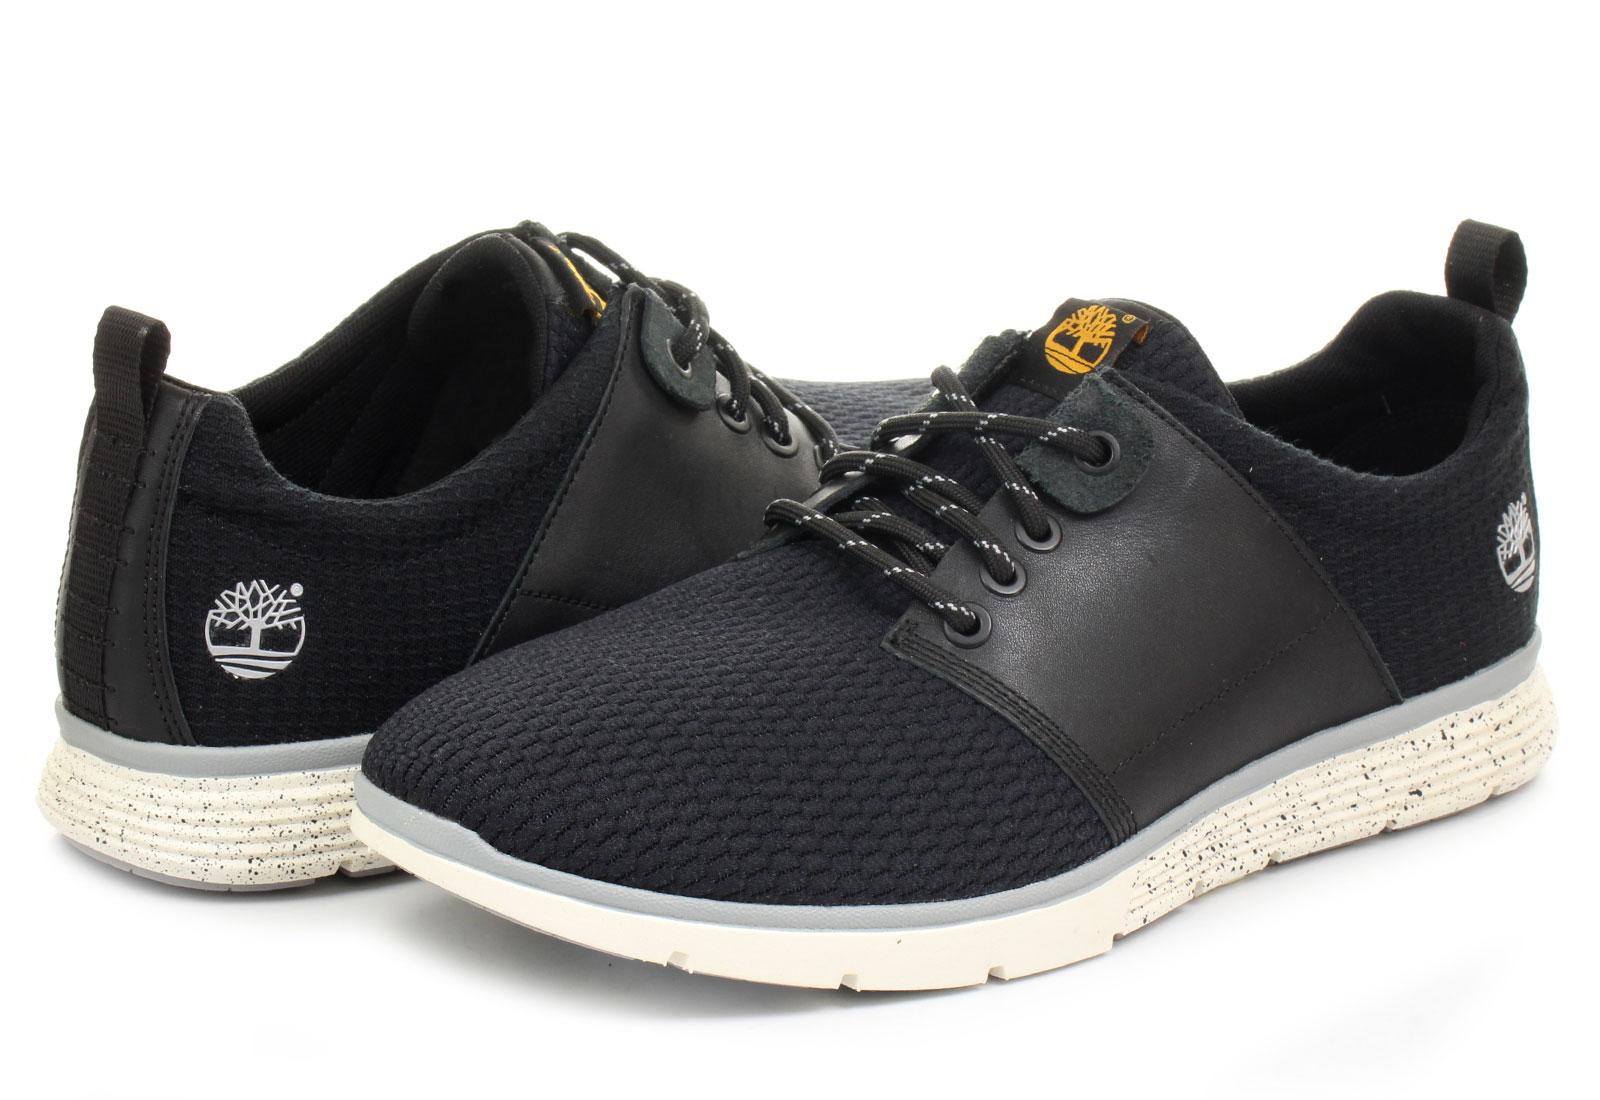 Timberland Shoes - Killington Ox - a15al-blk - Online shop